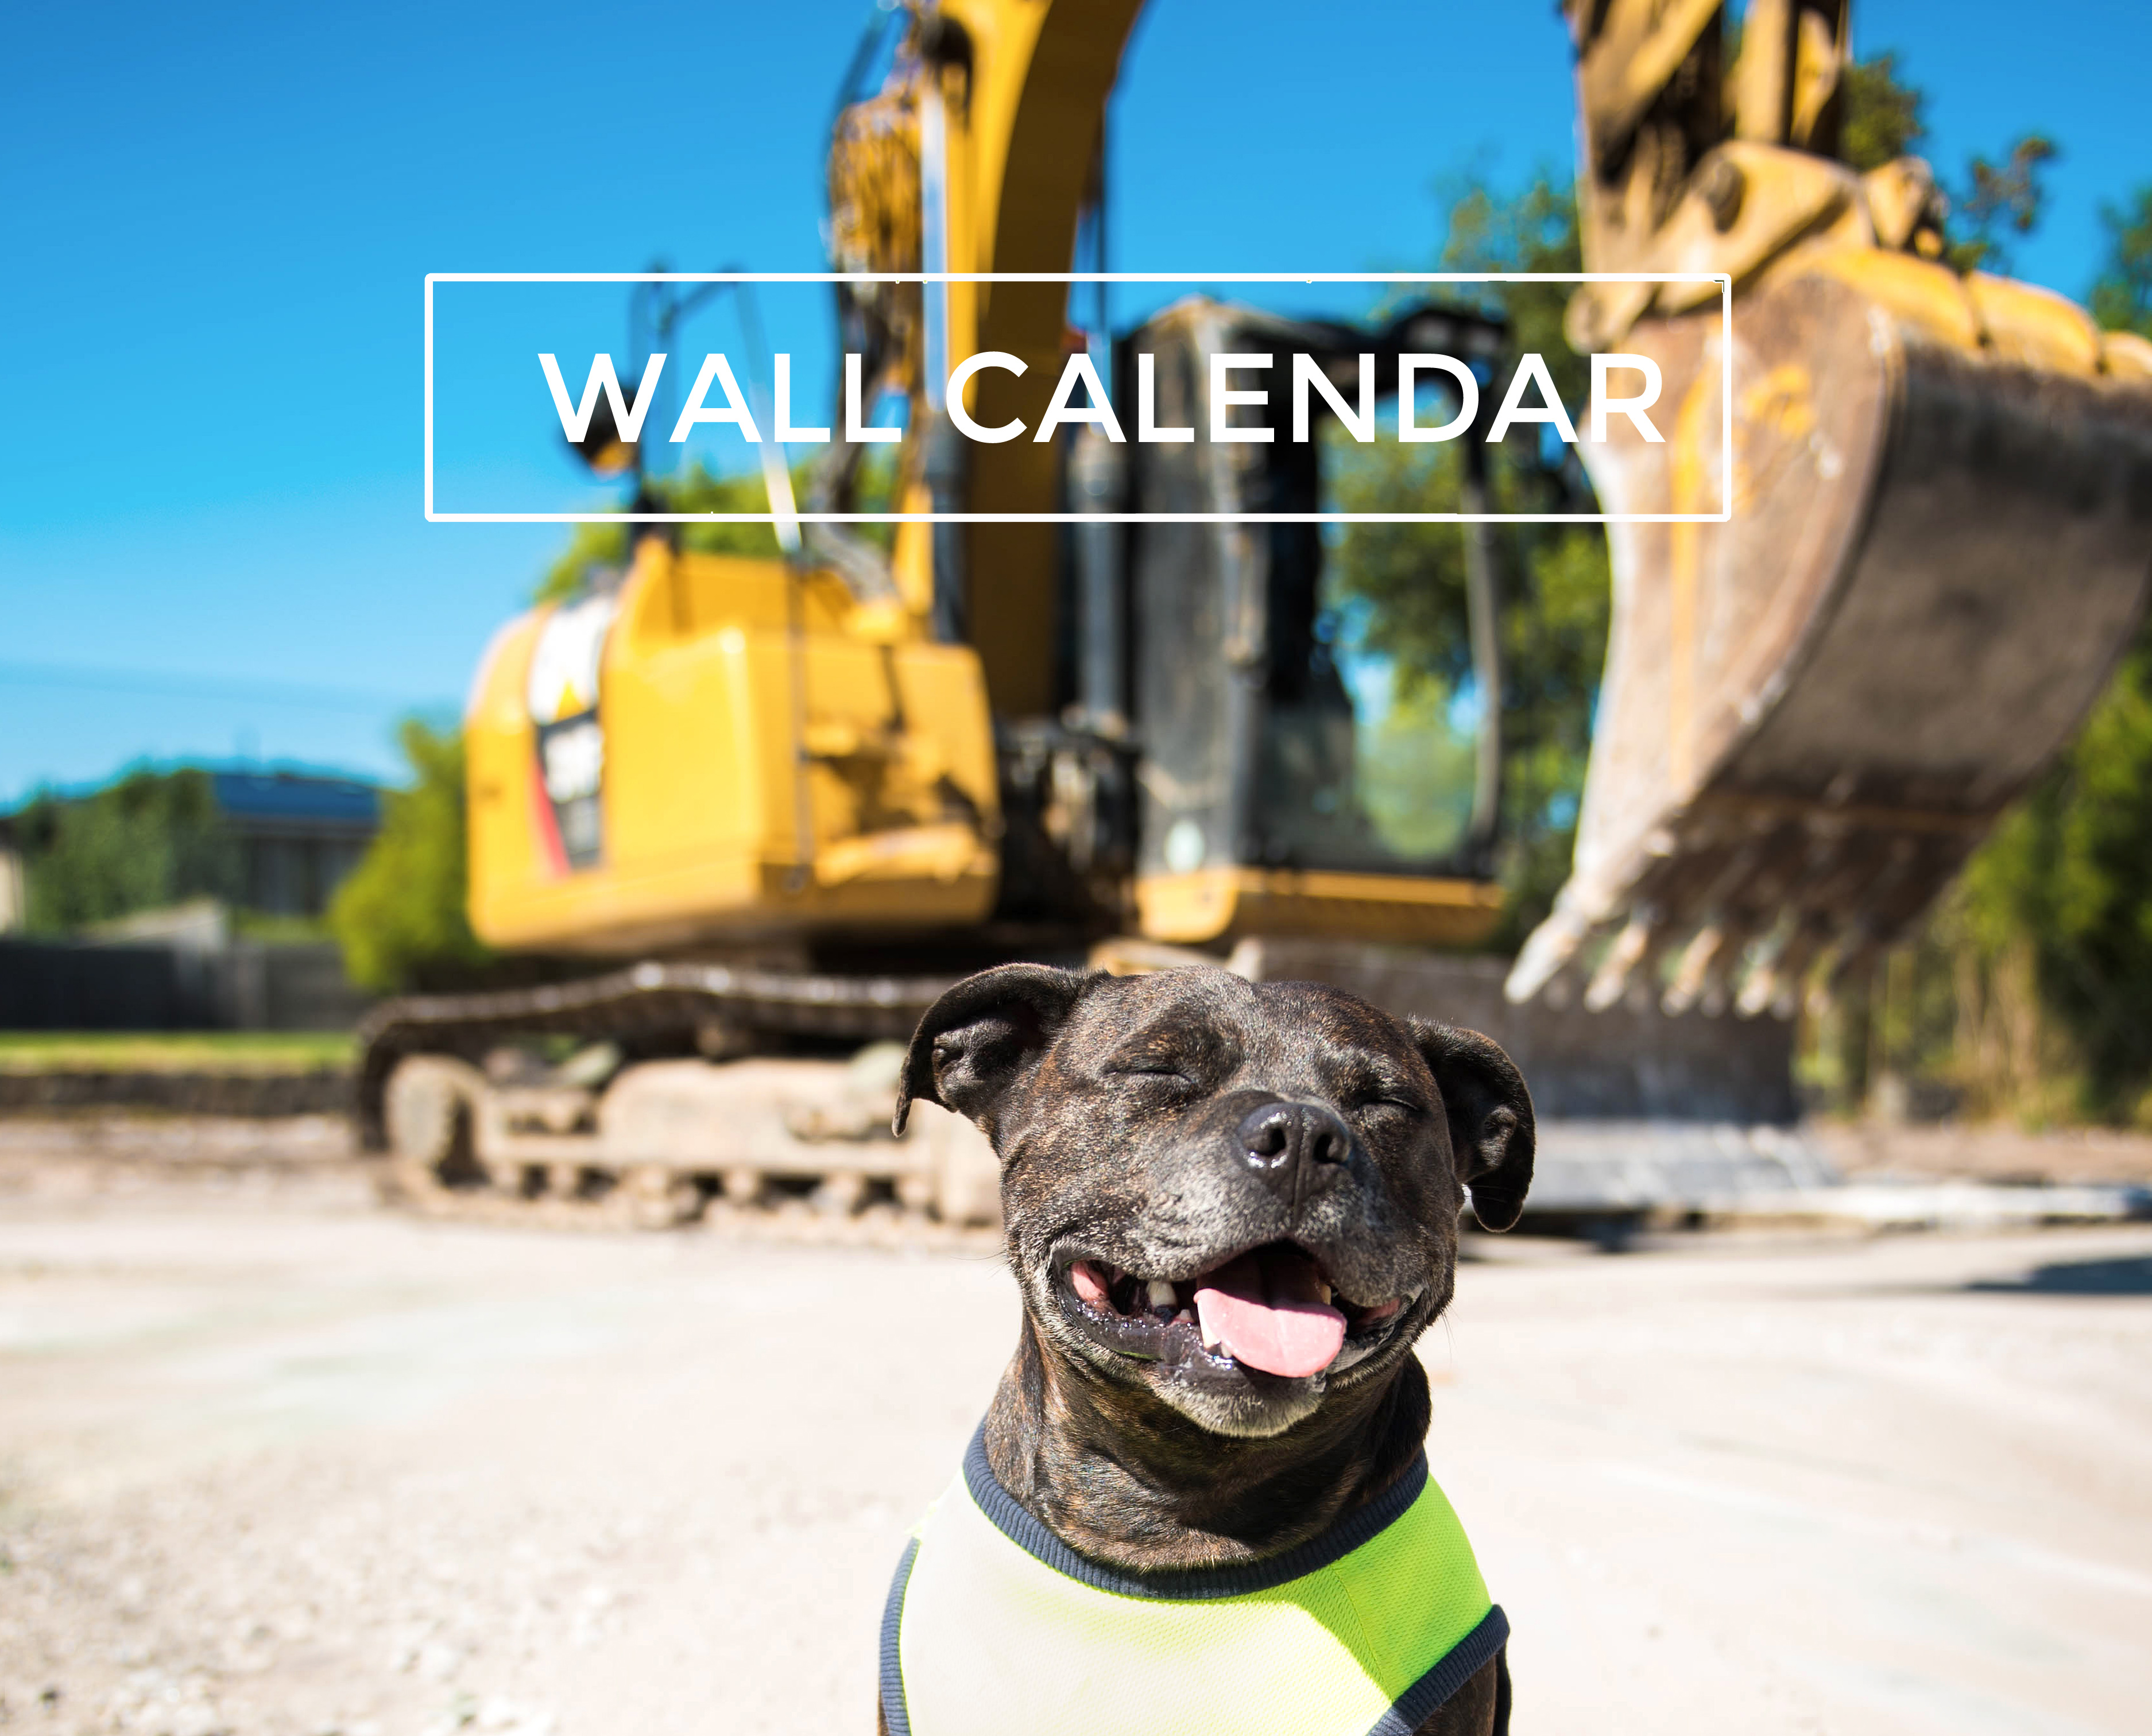 Staffordshire Bull Terrier Wall Calendar